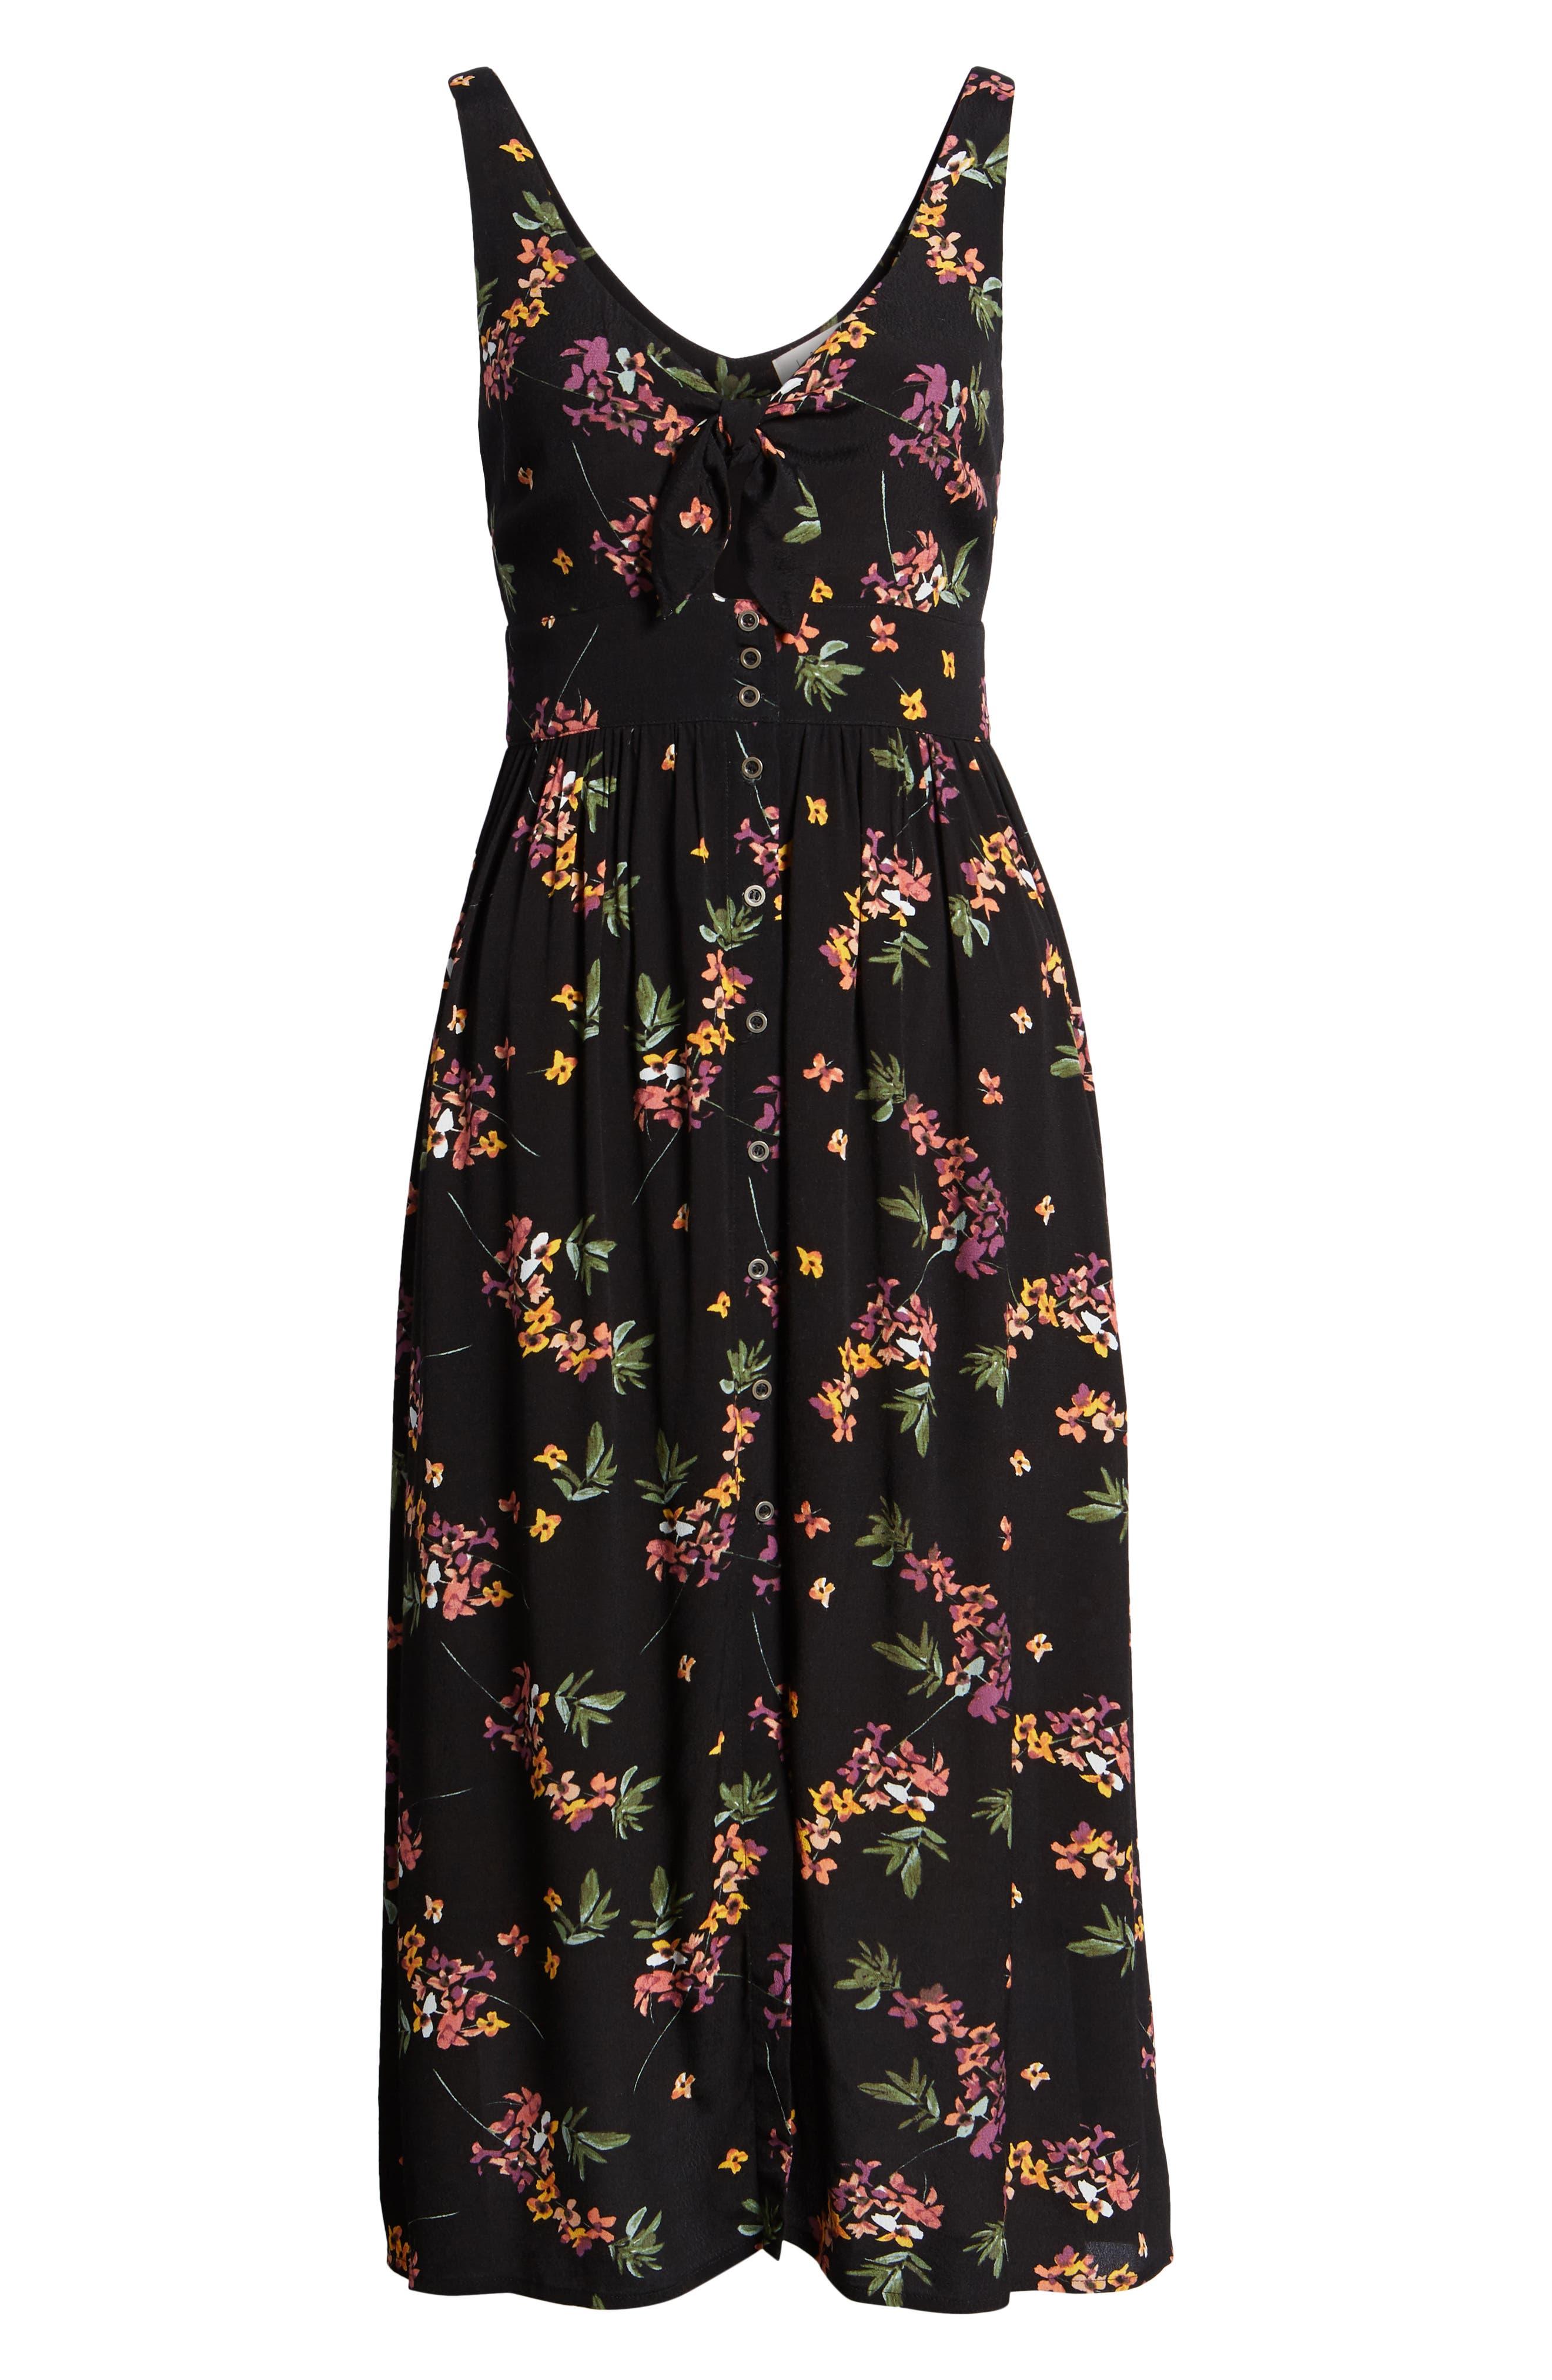 Floral Midi Dress,                             Alternate thumbnail 7, color,                             001